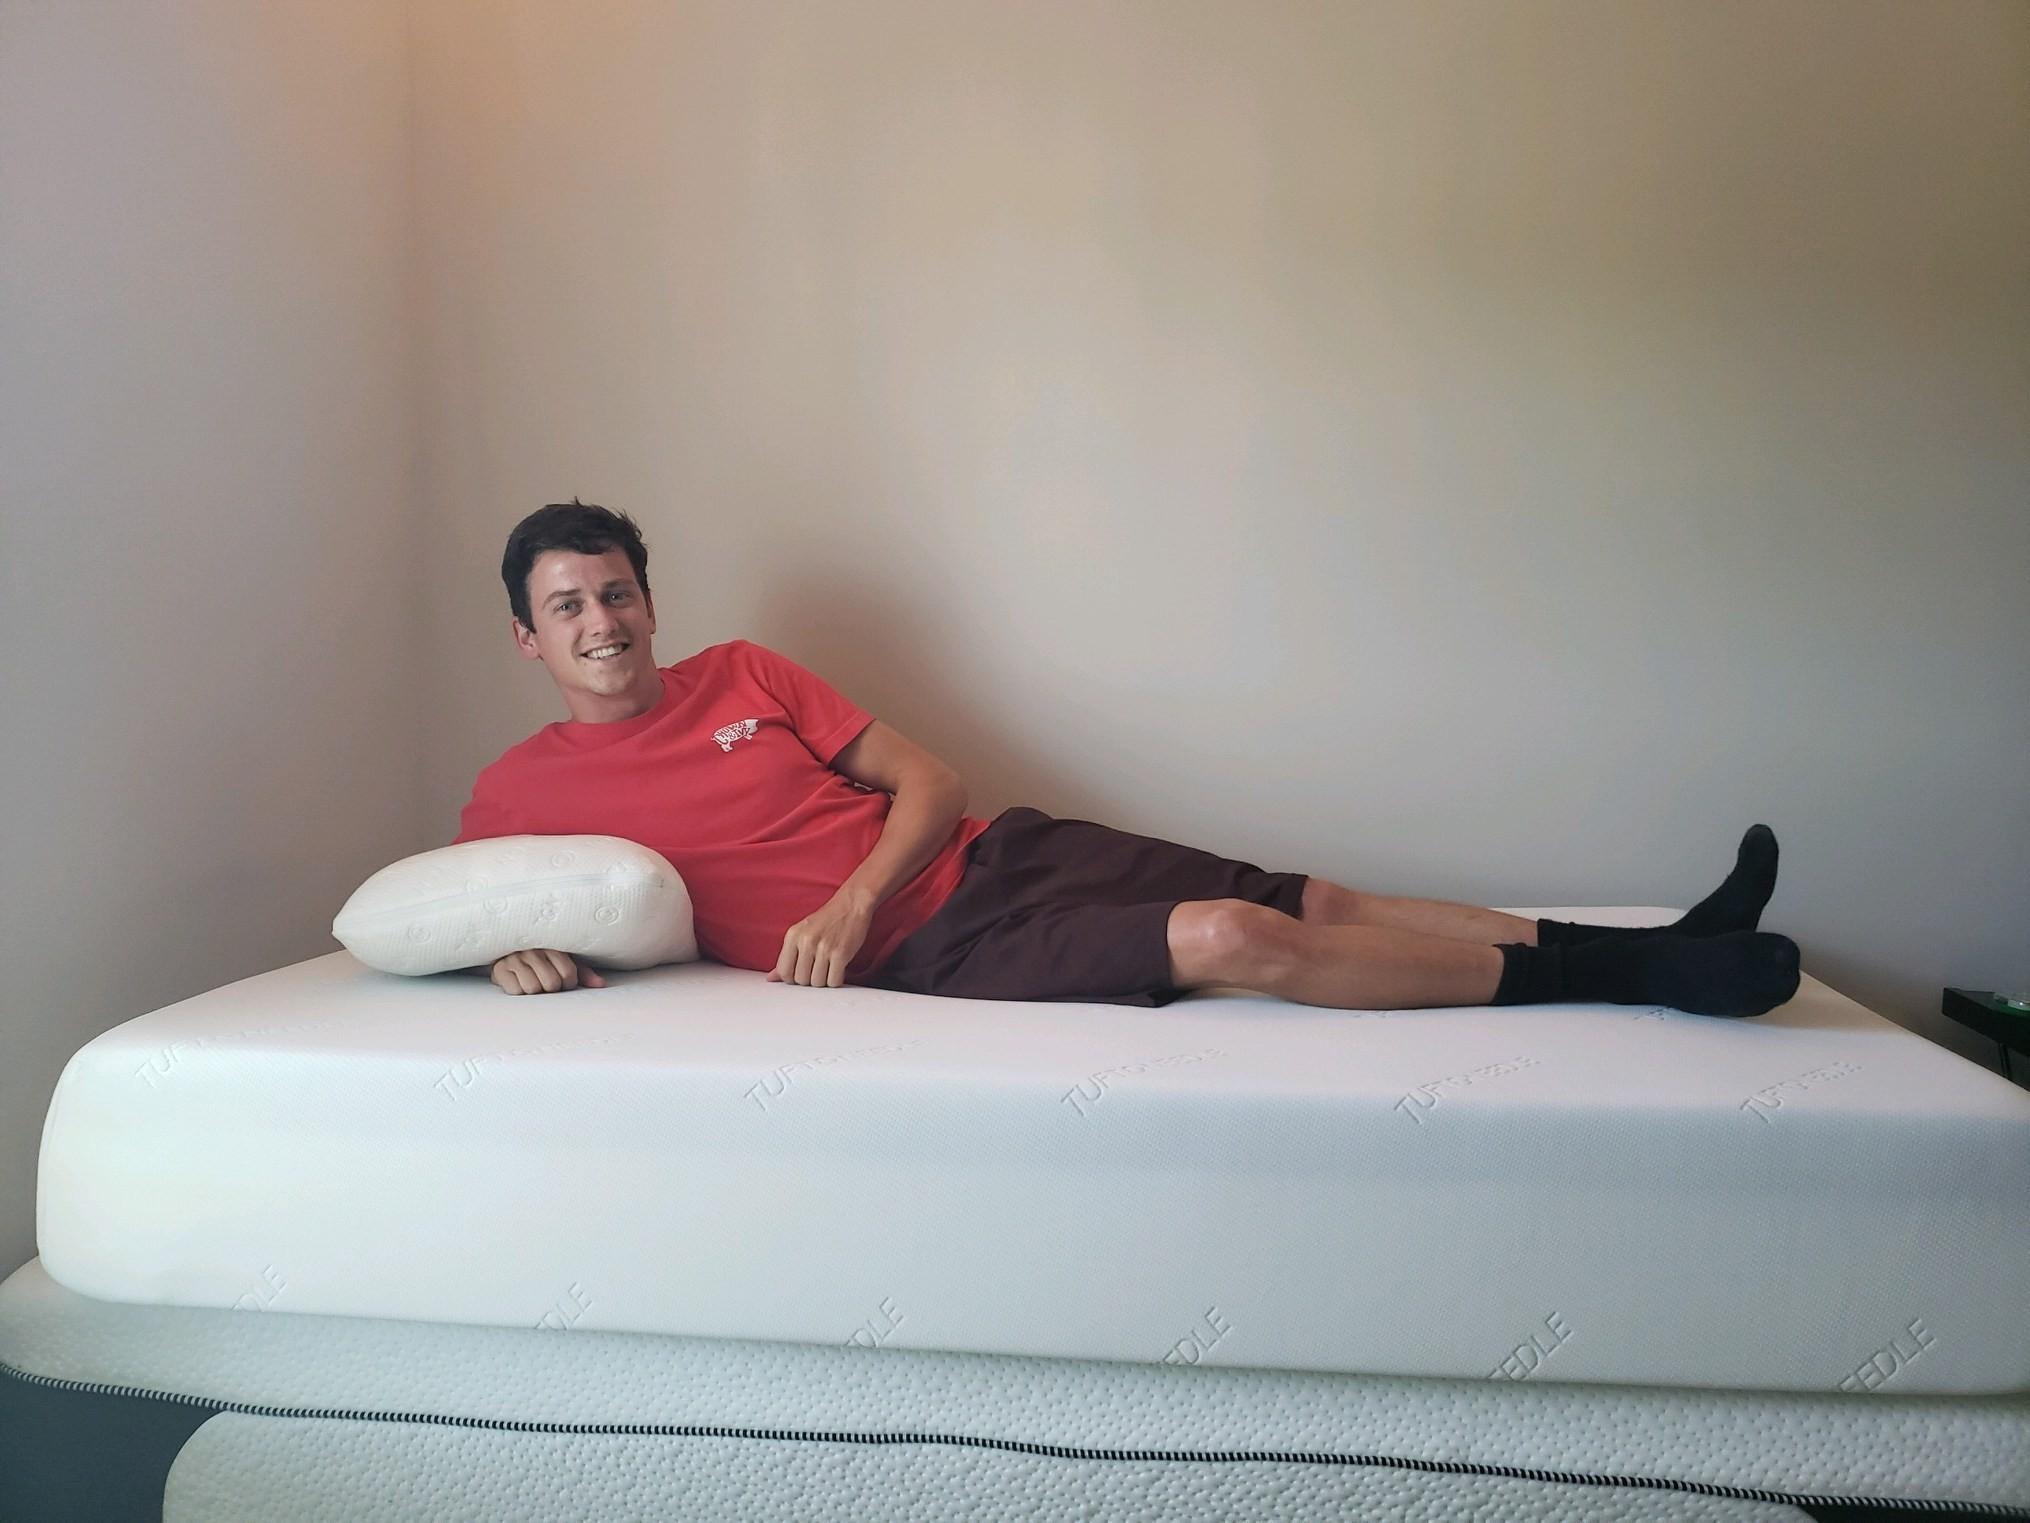 Nathan on his Tuft & Needle mattress